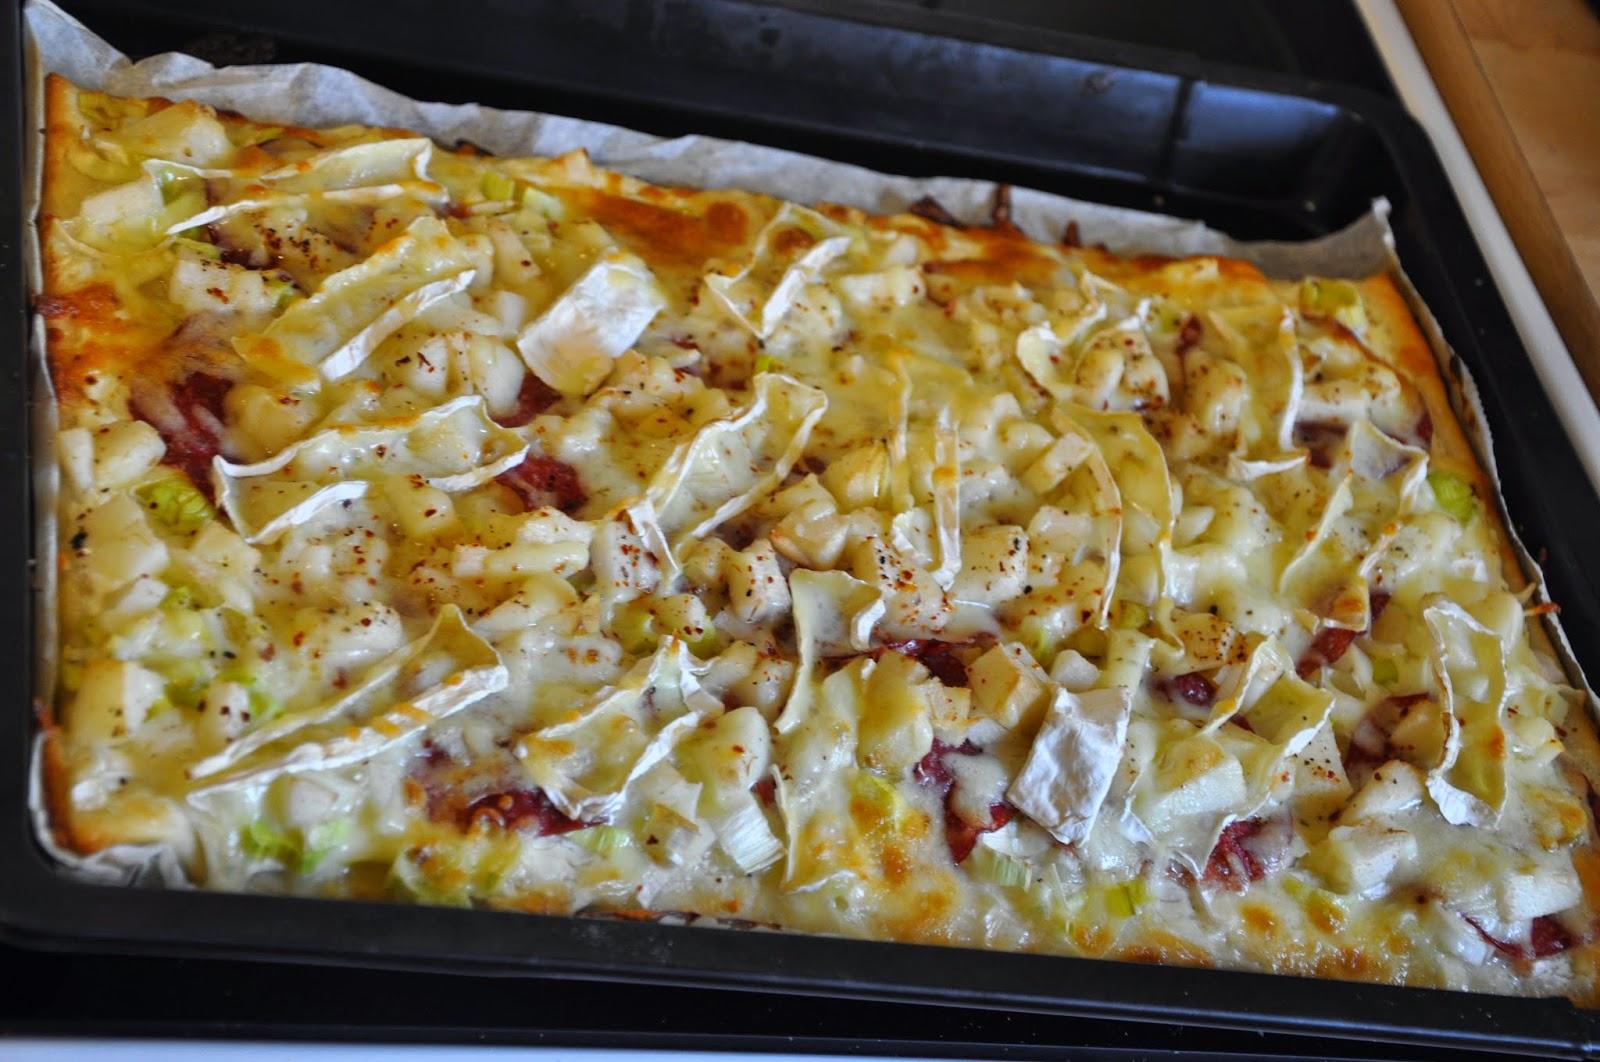 Spannenlanger Hansel, nudeldicke Dirn' - Leckere Birnenverwertung | Birnen-Camembert-Pizza